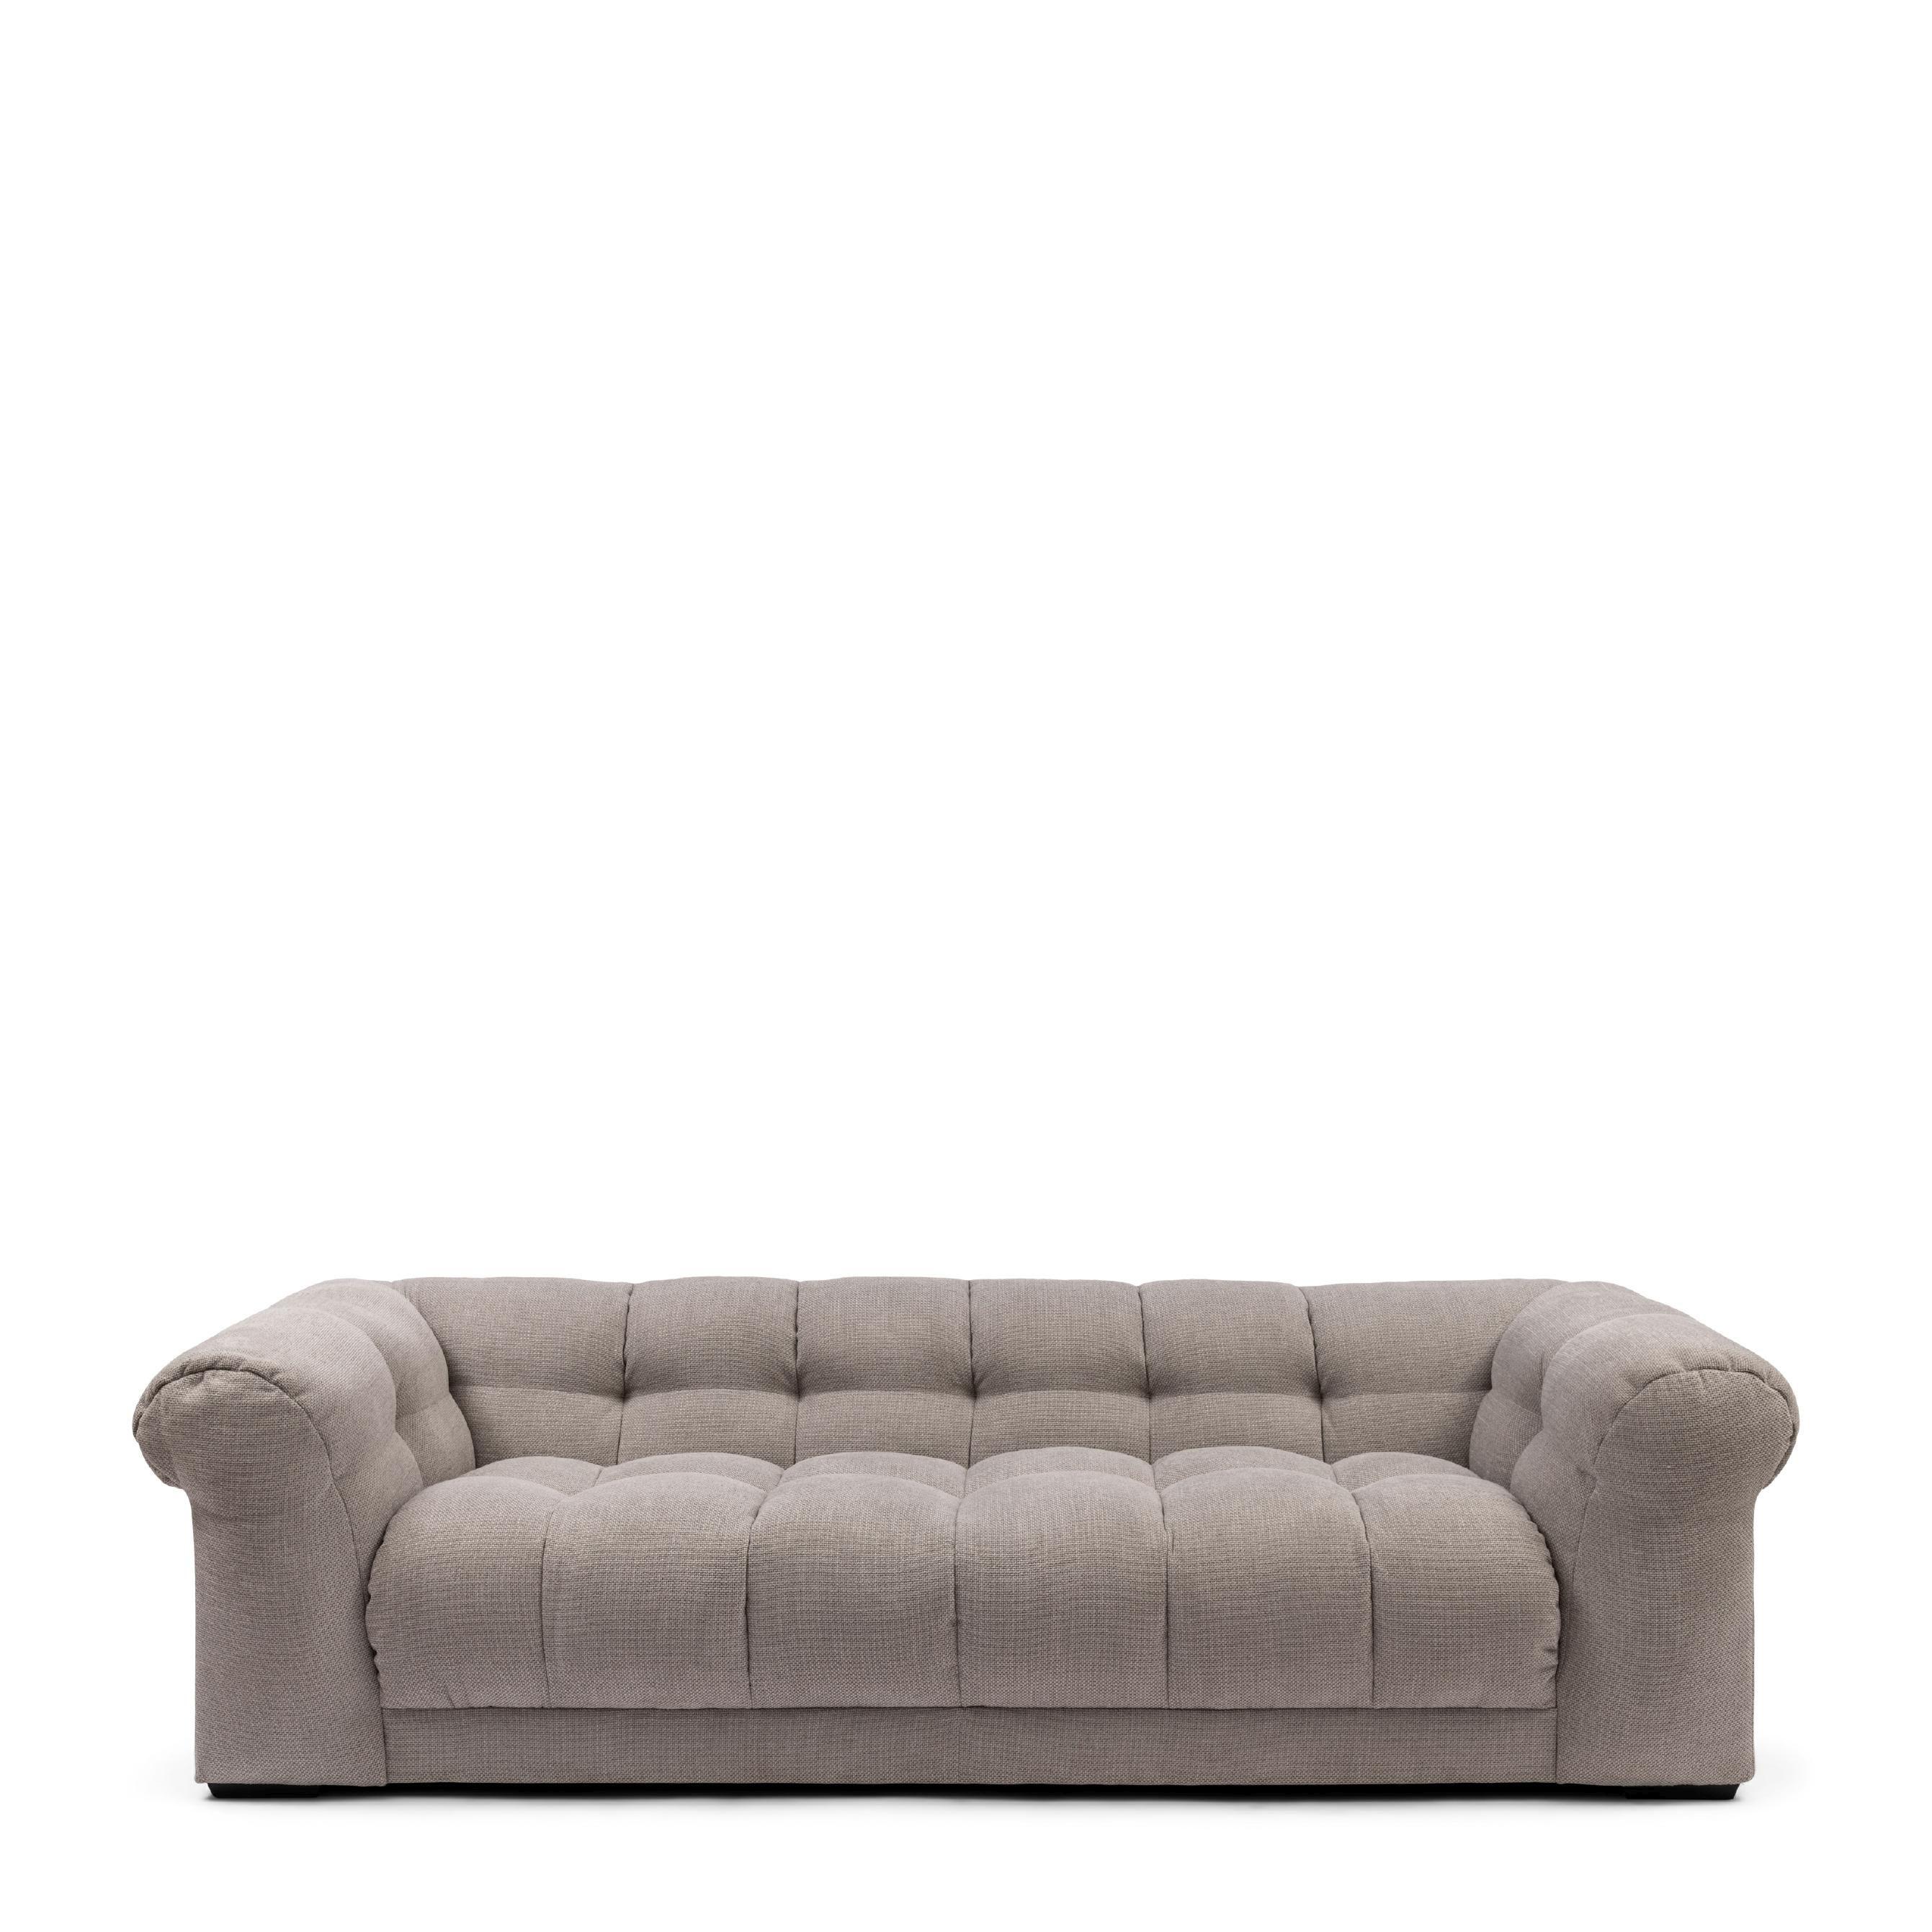 Cobble Hill Sofa 3,5 Seater celtic weave pebbles stone / Rivièra Maison